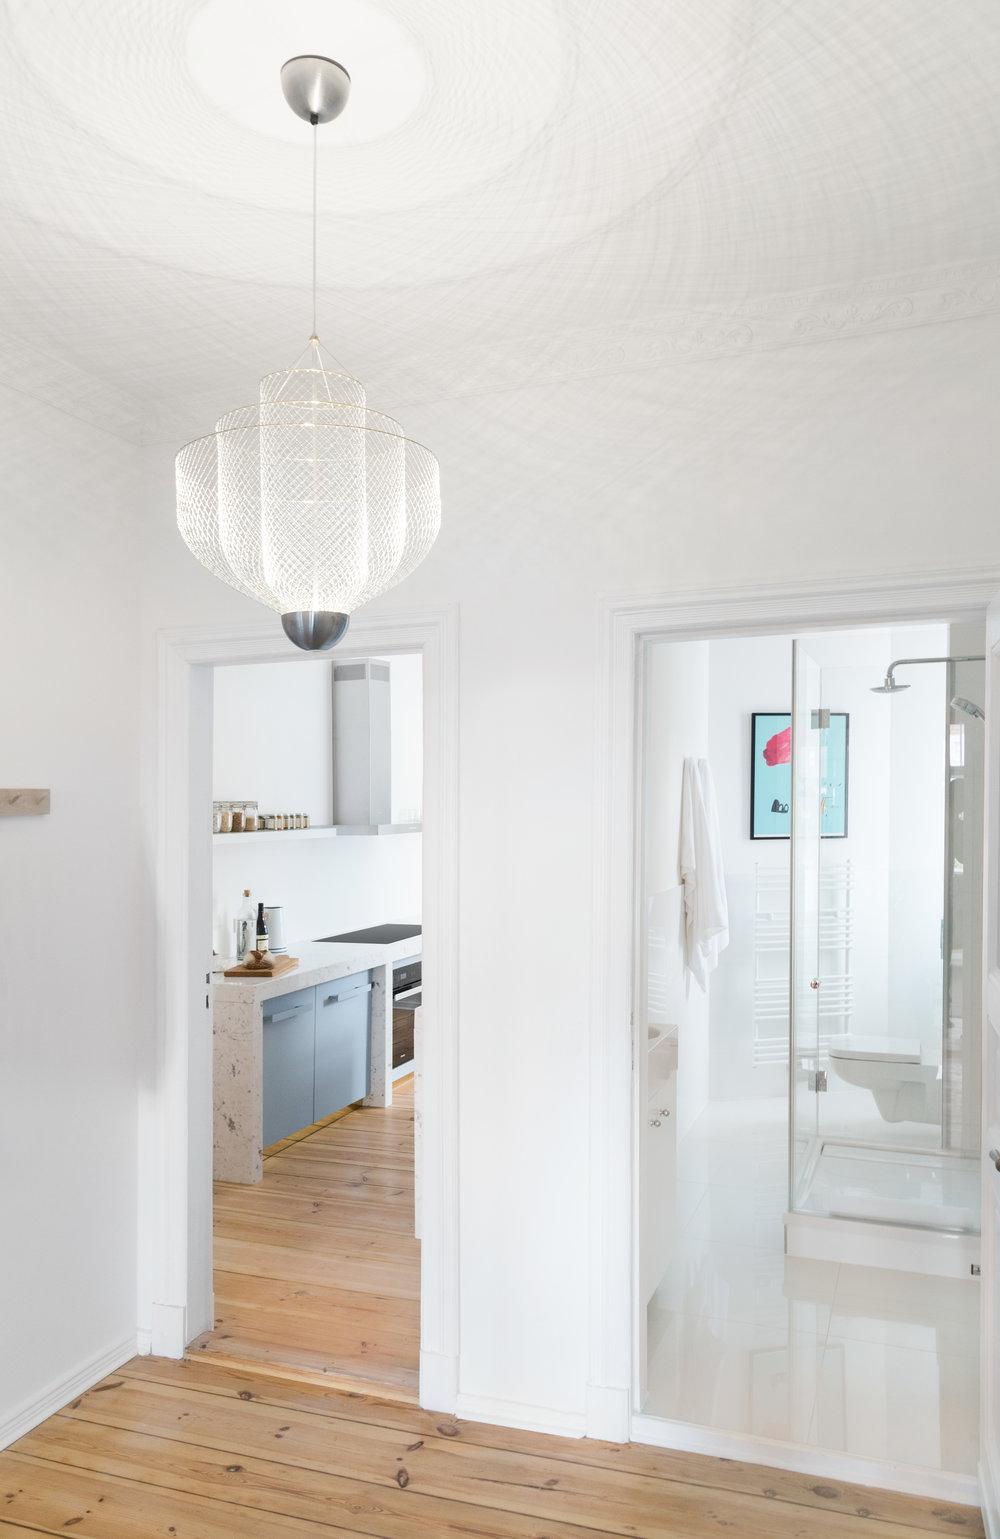 02-White_Arrow-Paul-Lincke-Ufer-Apartment.jpg